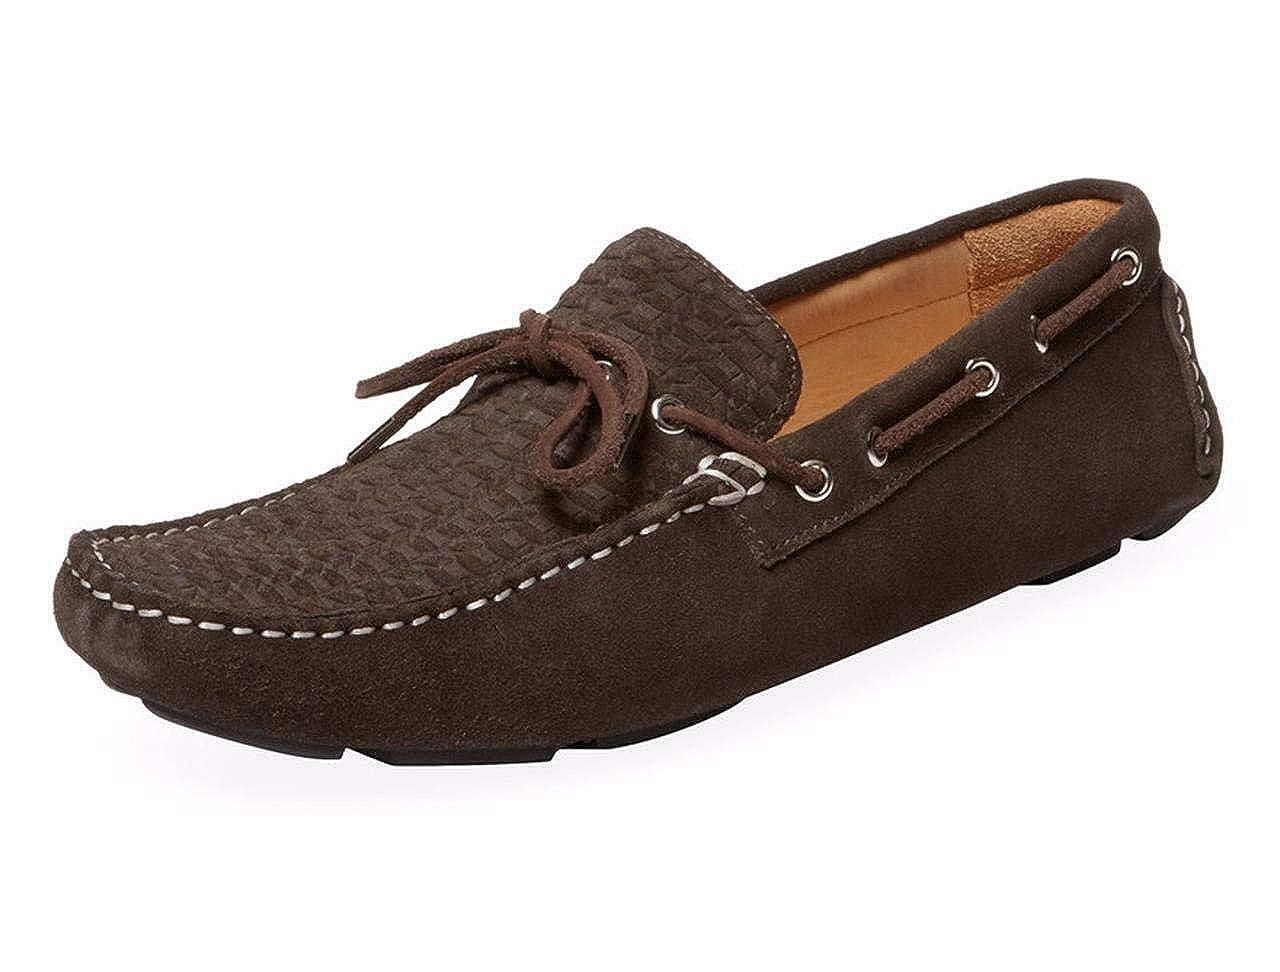 de7721f8cf Amazon.com   Millburn Co. Suede Chocolate Tie Drivers Men Size 9 ...